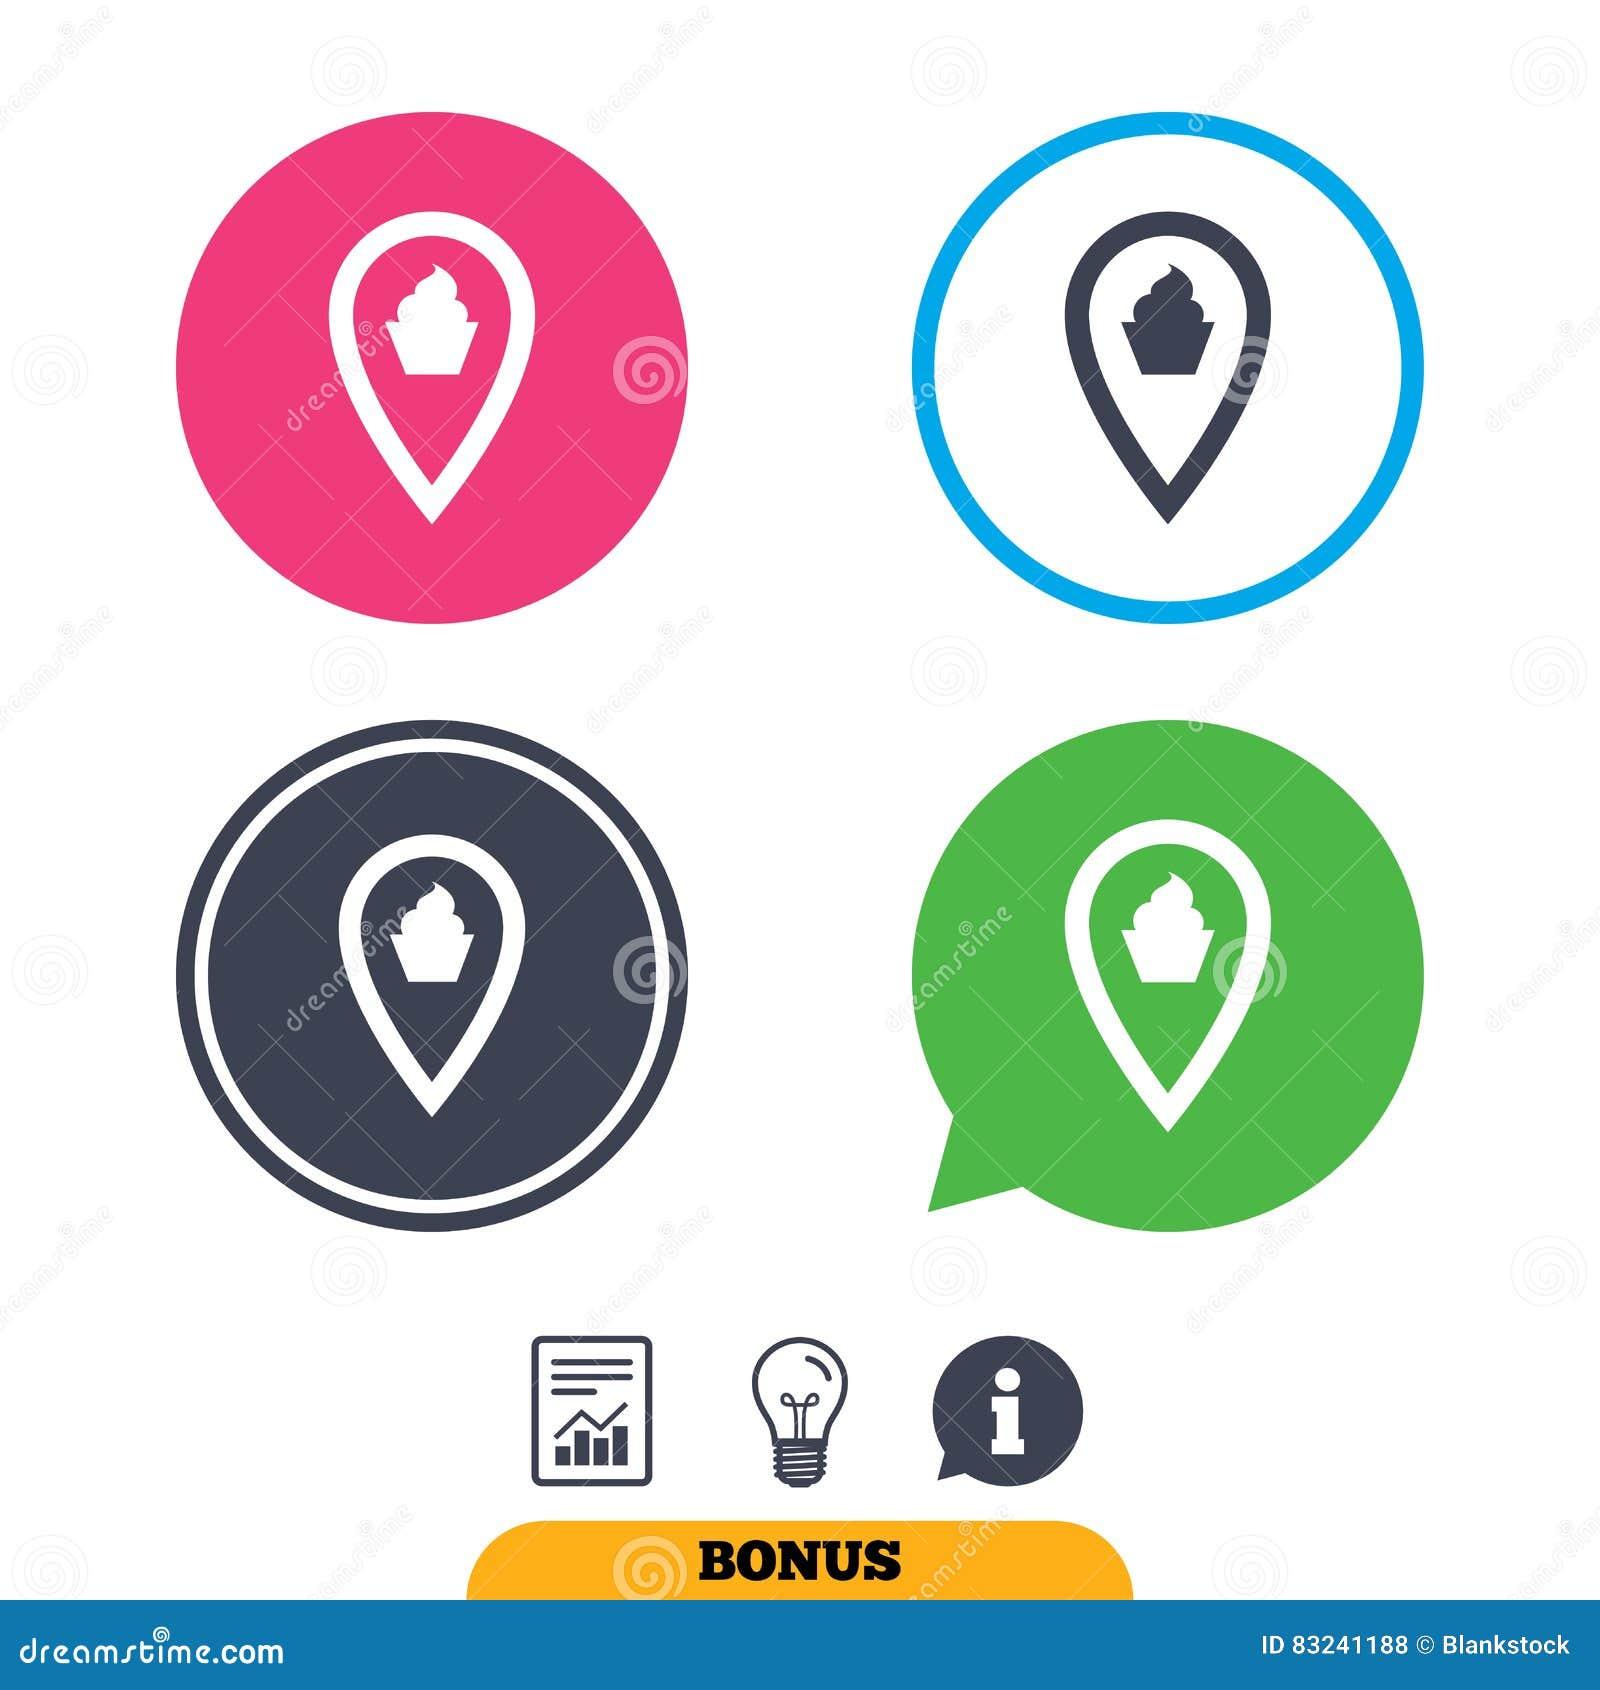 Map Pointer Food Sign Icon. Marker Symbol. Stock Vector ... on mod symbols, power symbols, crane symbols, sport symbols, baltimore symbols, cd symbols, race symbols, state symbols, real symbols, cook symbols,